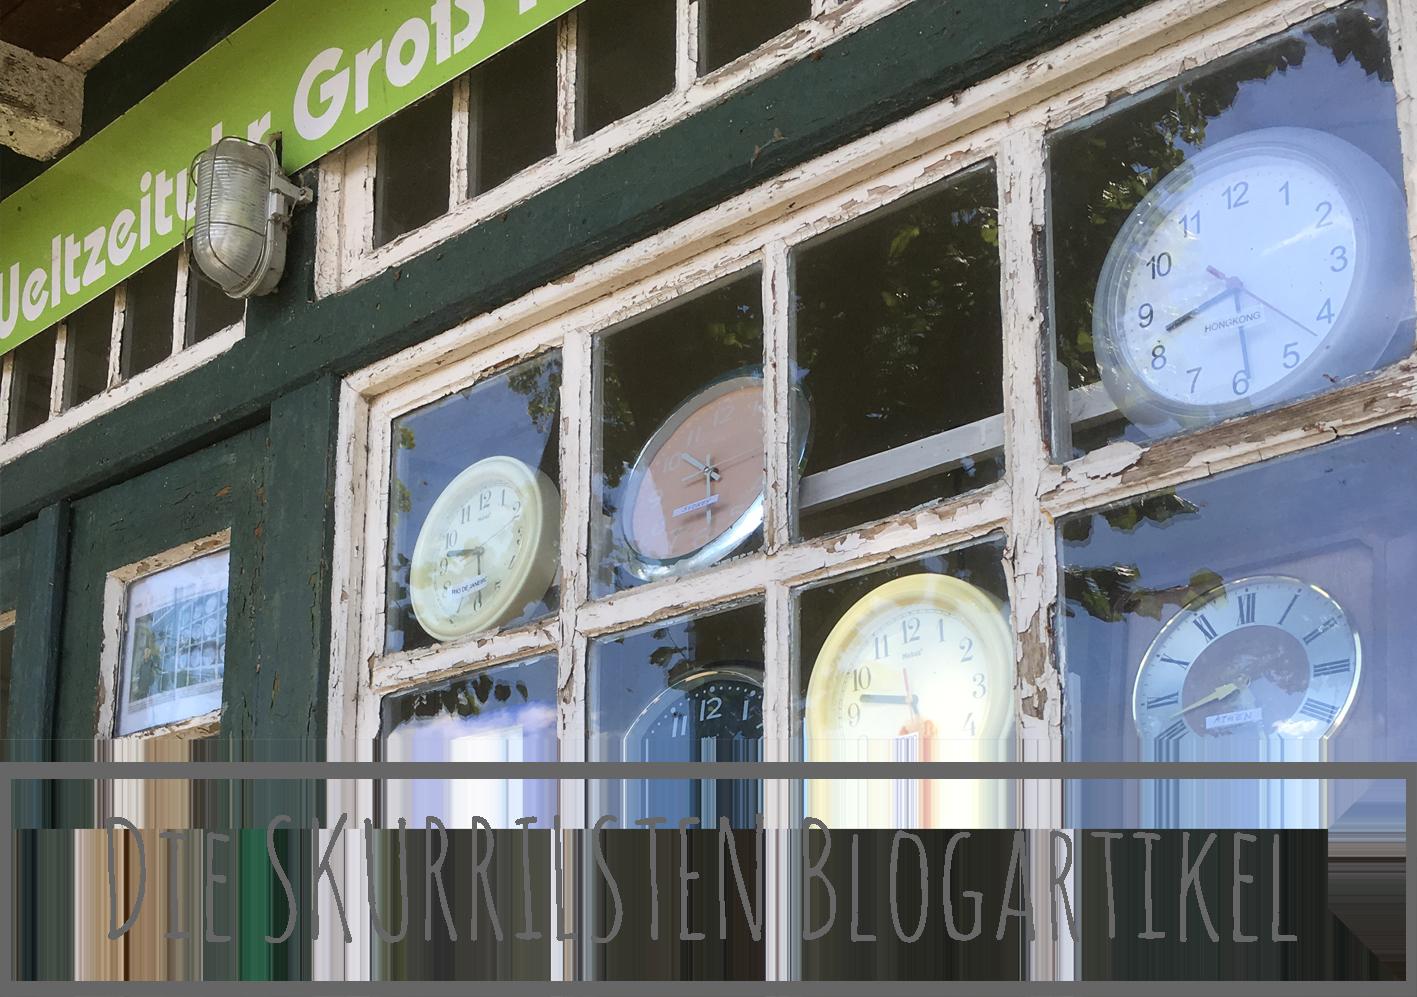 (c) Oderbruch-blog.de   Skurrilste Artikel